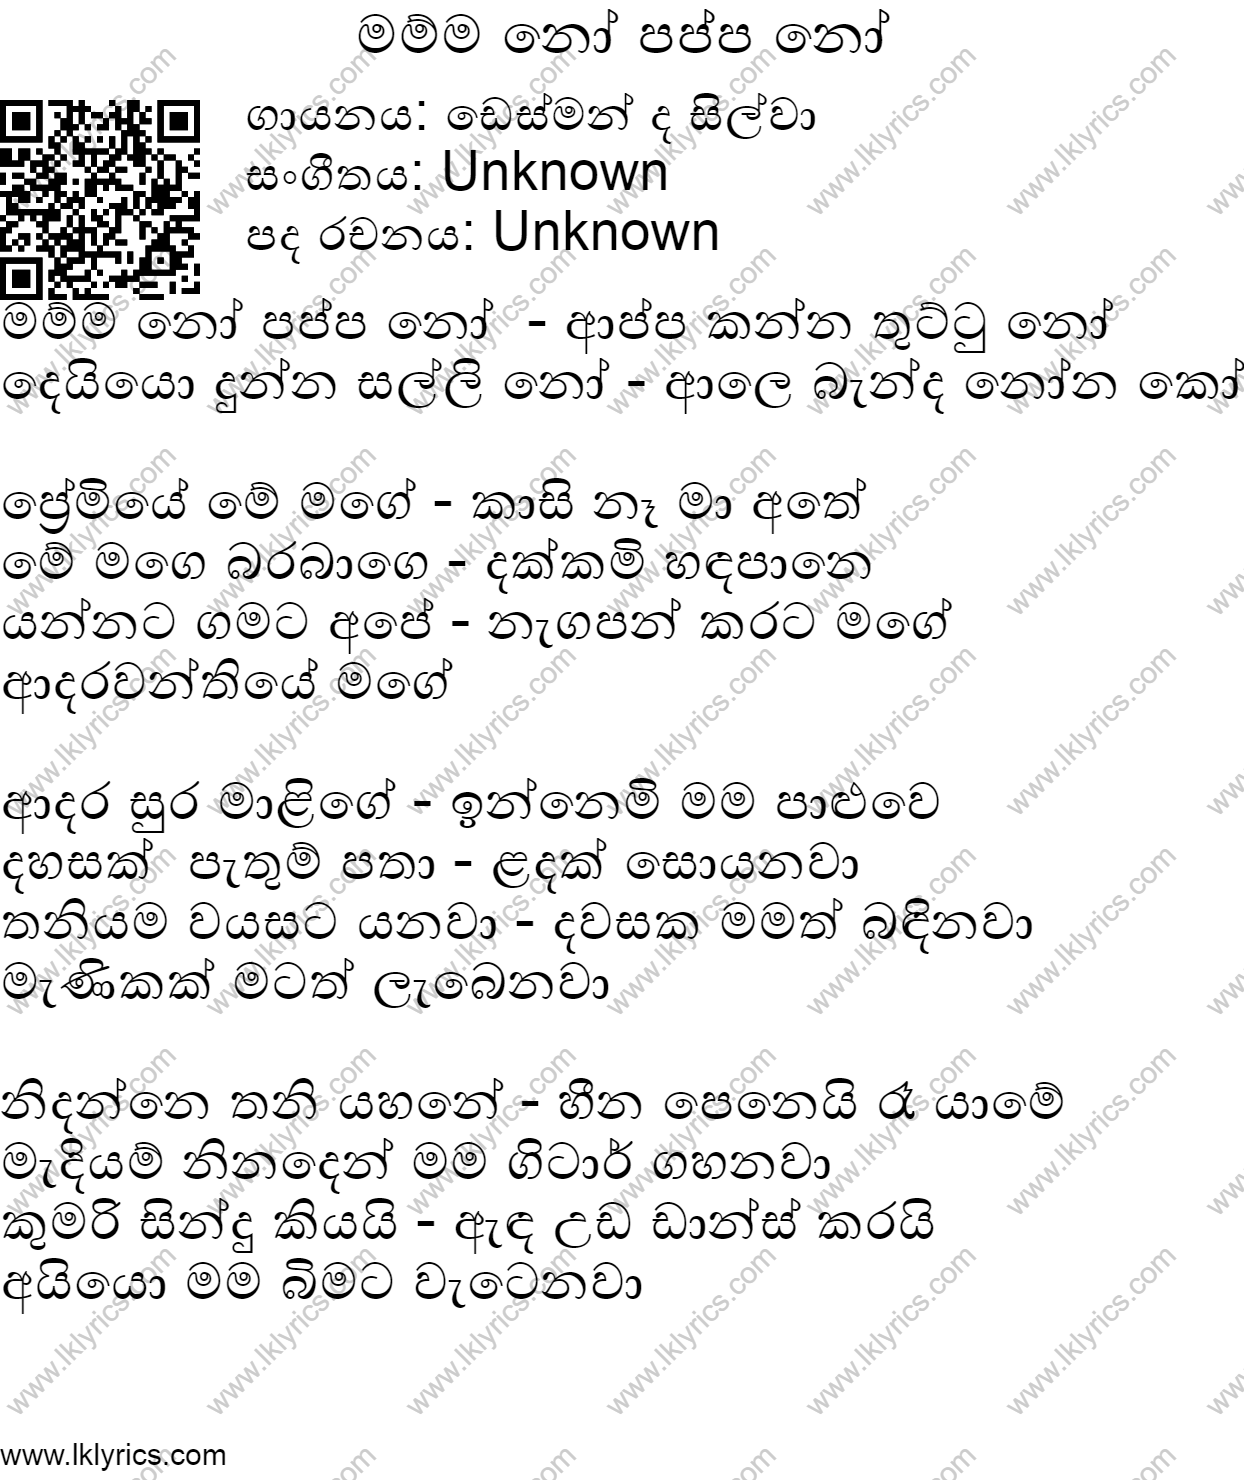 Athamita Kasi Panam Lyrics - LK Lyrics